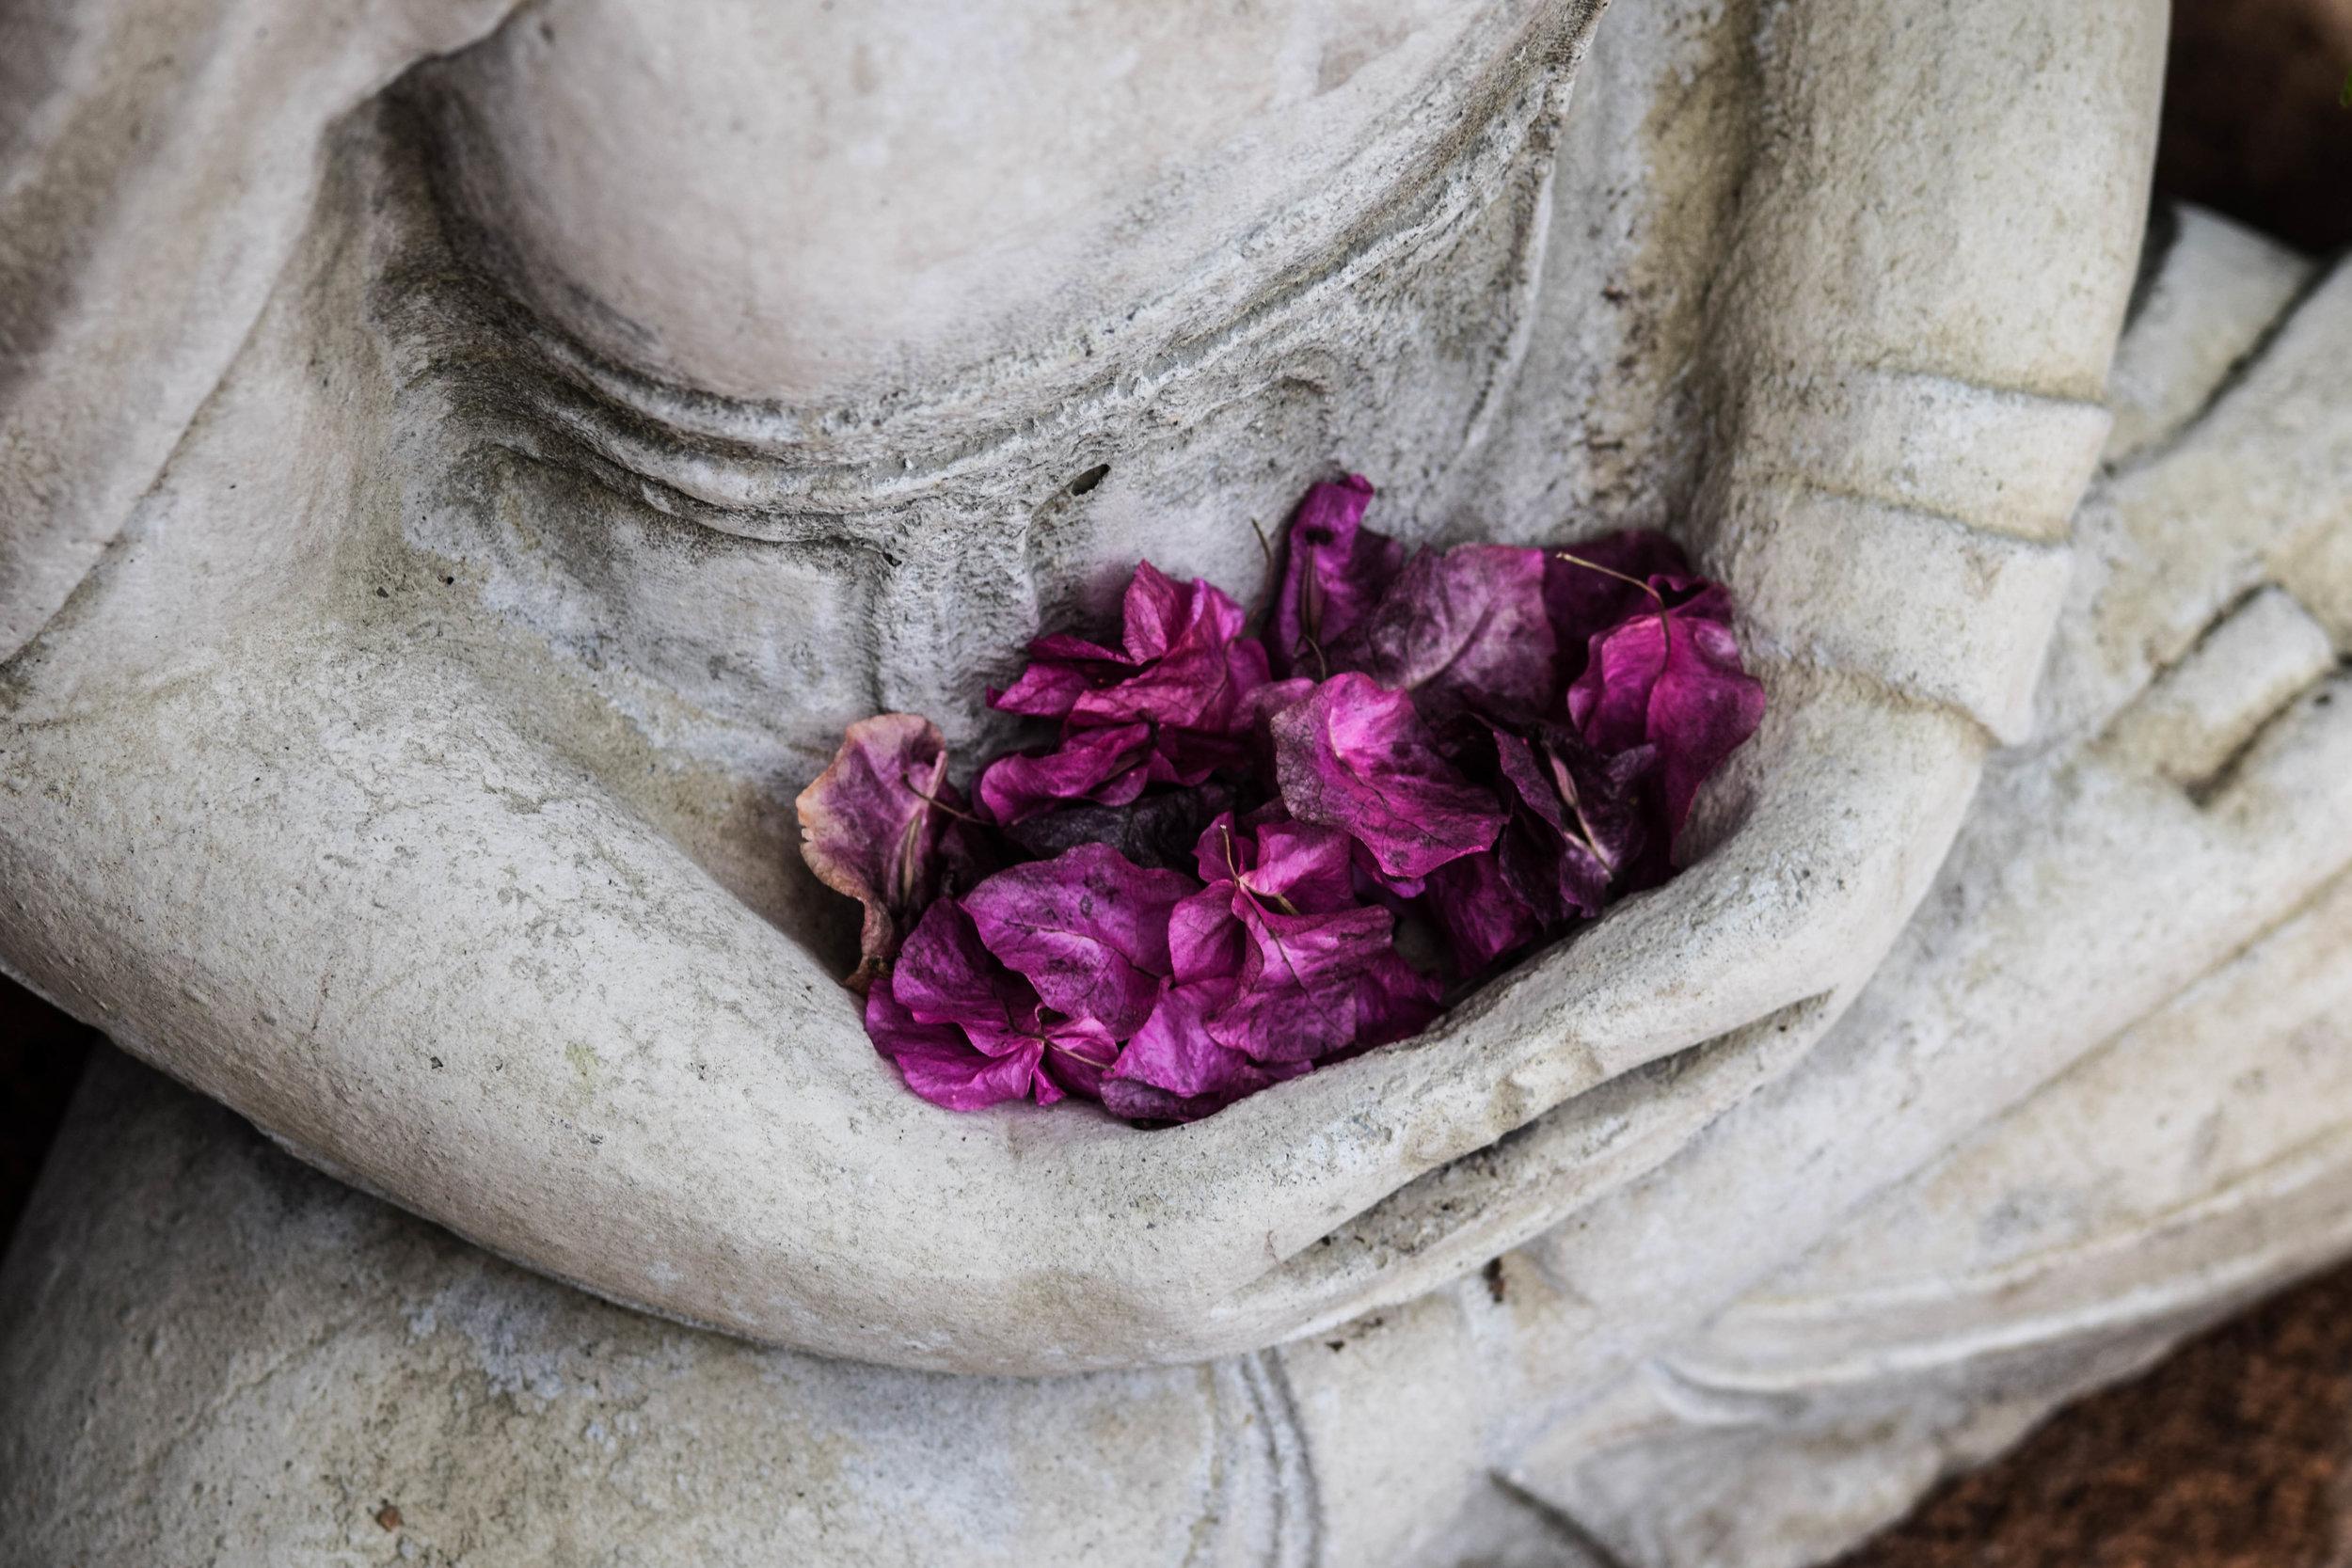 Mary-flowers-sacrifice-christ-narrative-lectionary